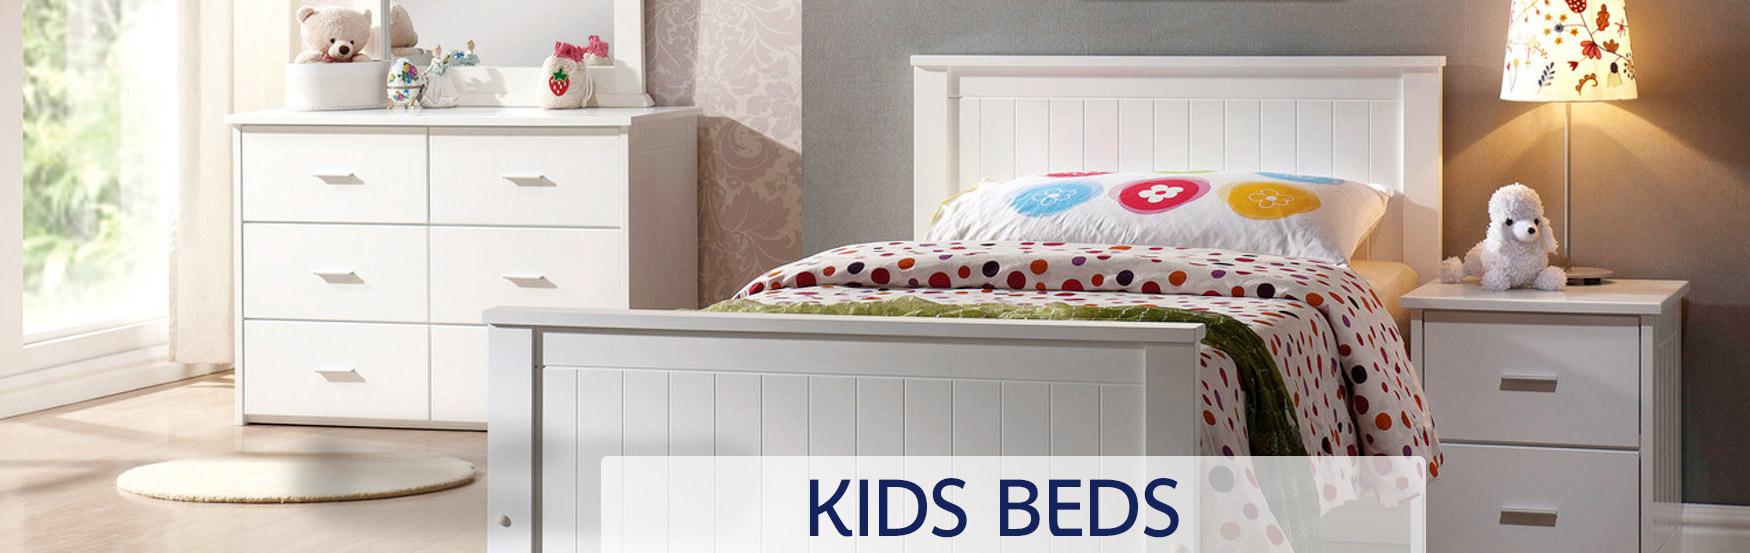 Kids Beds Banner